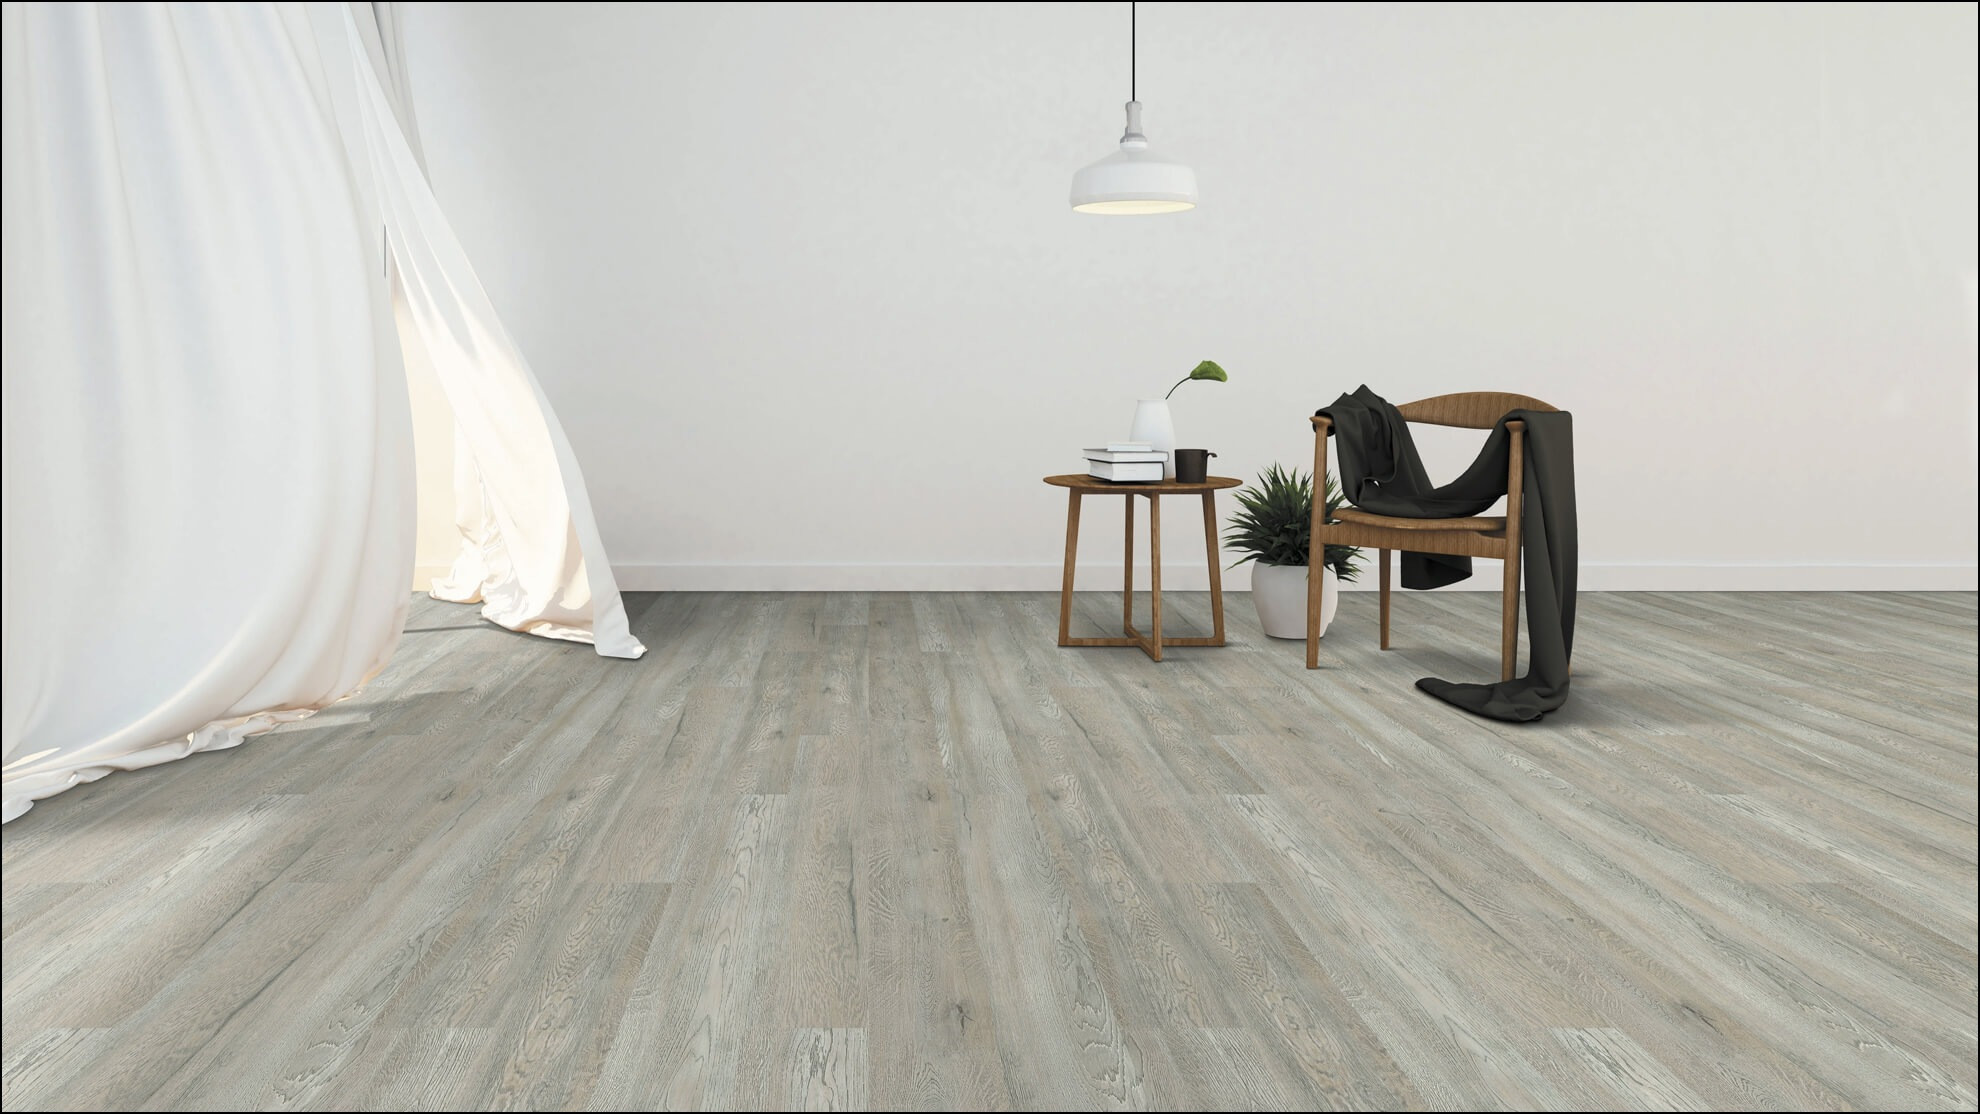 where to buy hardwood flooring in toronto of hardwood flooring suppliers france flooring ideas in hardwood flooring installation san diego collection earthwerks flooring of hardwood flooring installation san diego